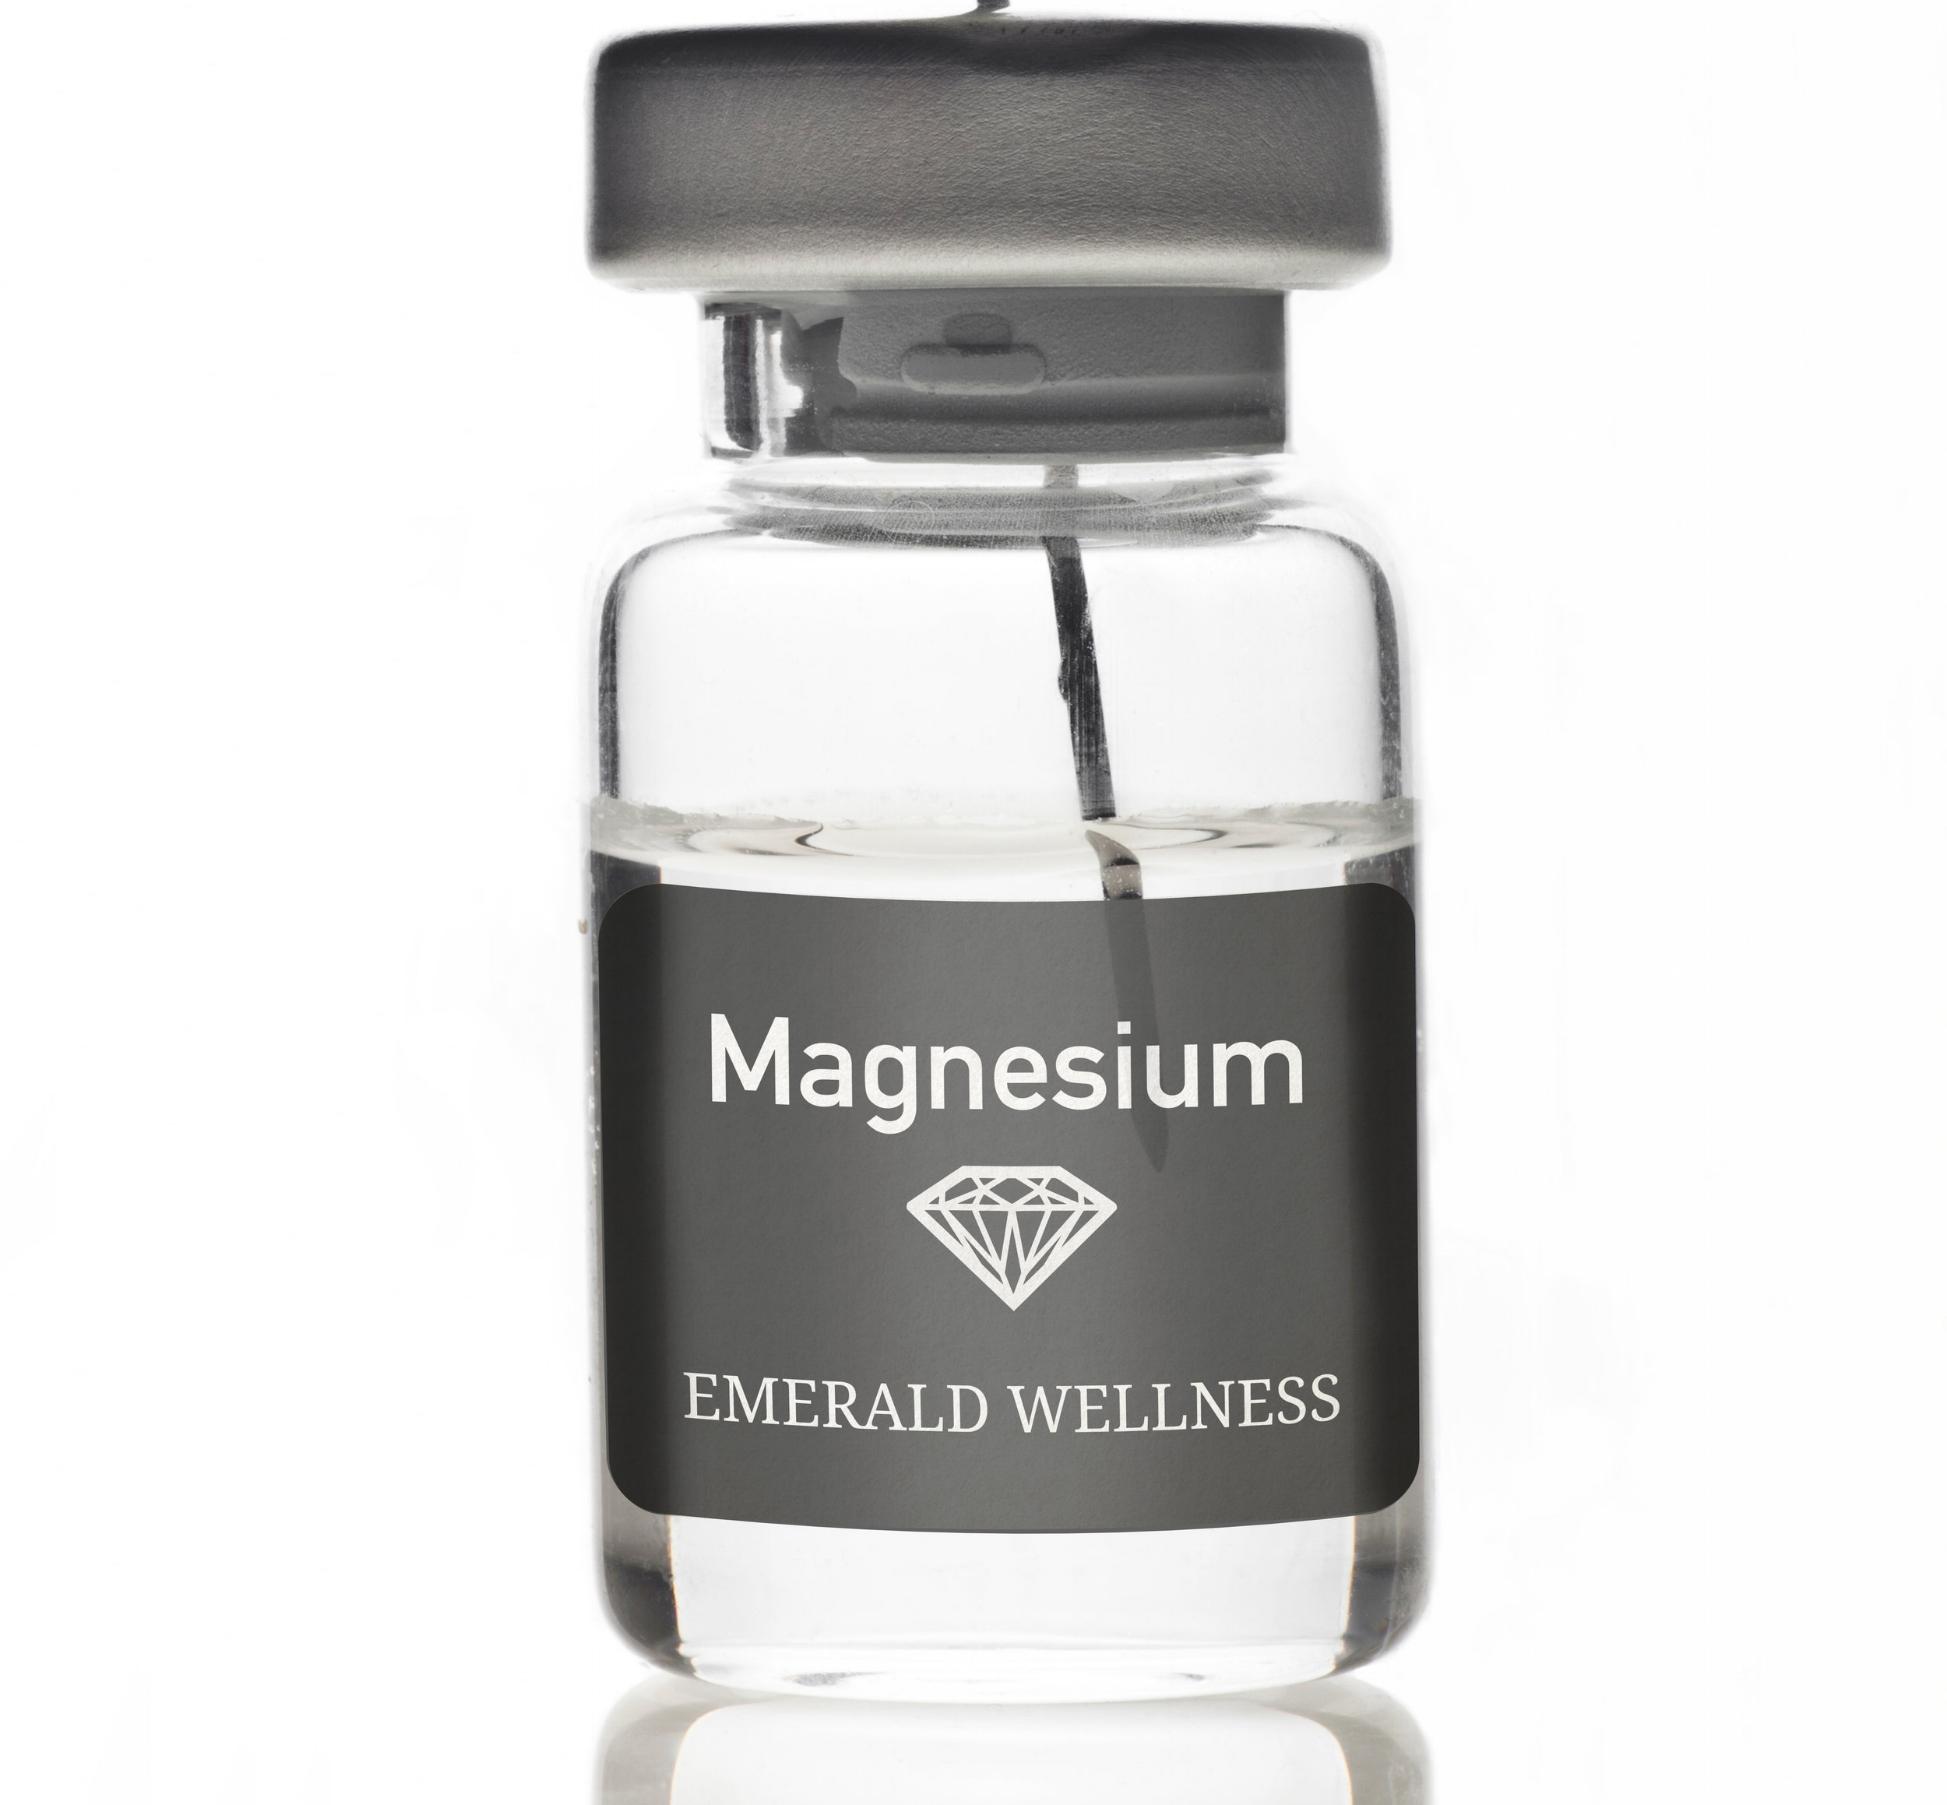 Magnesium IV Therapy Edmonton